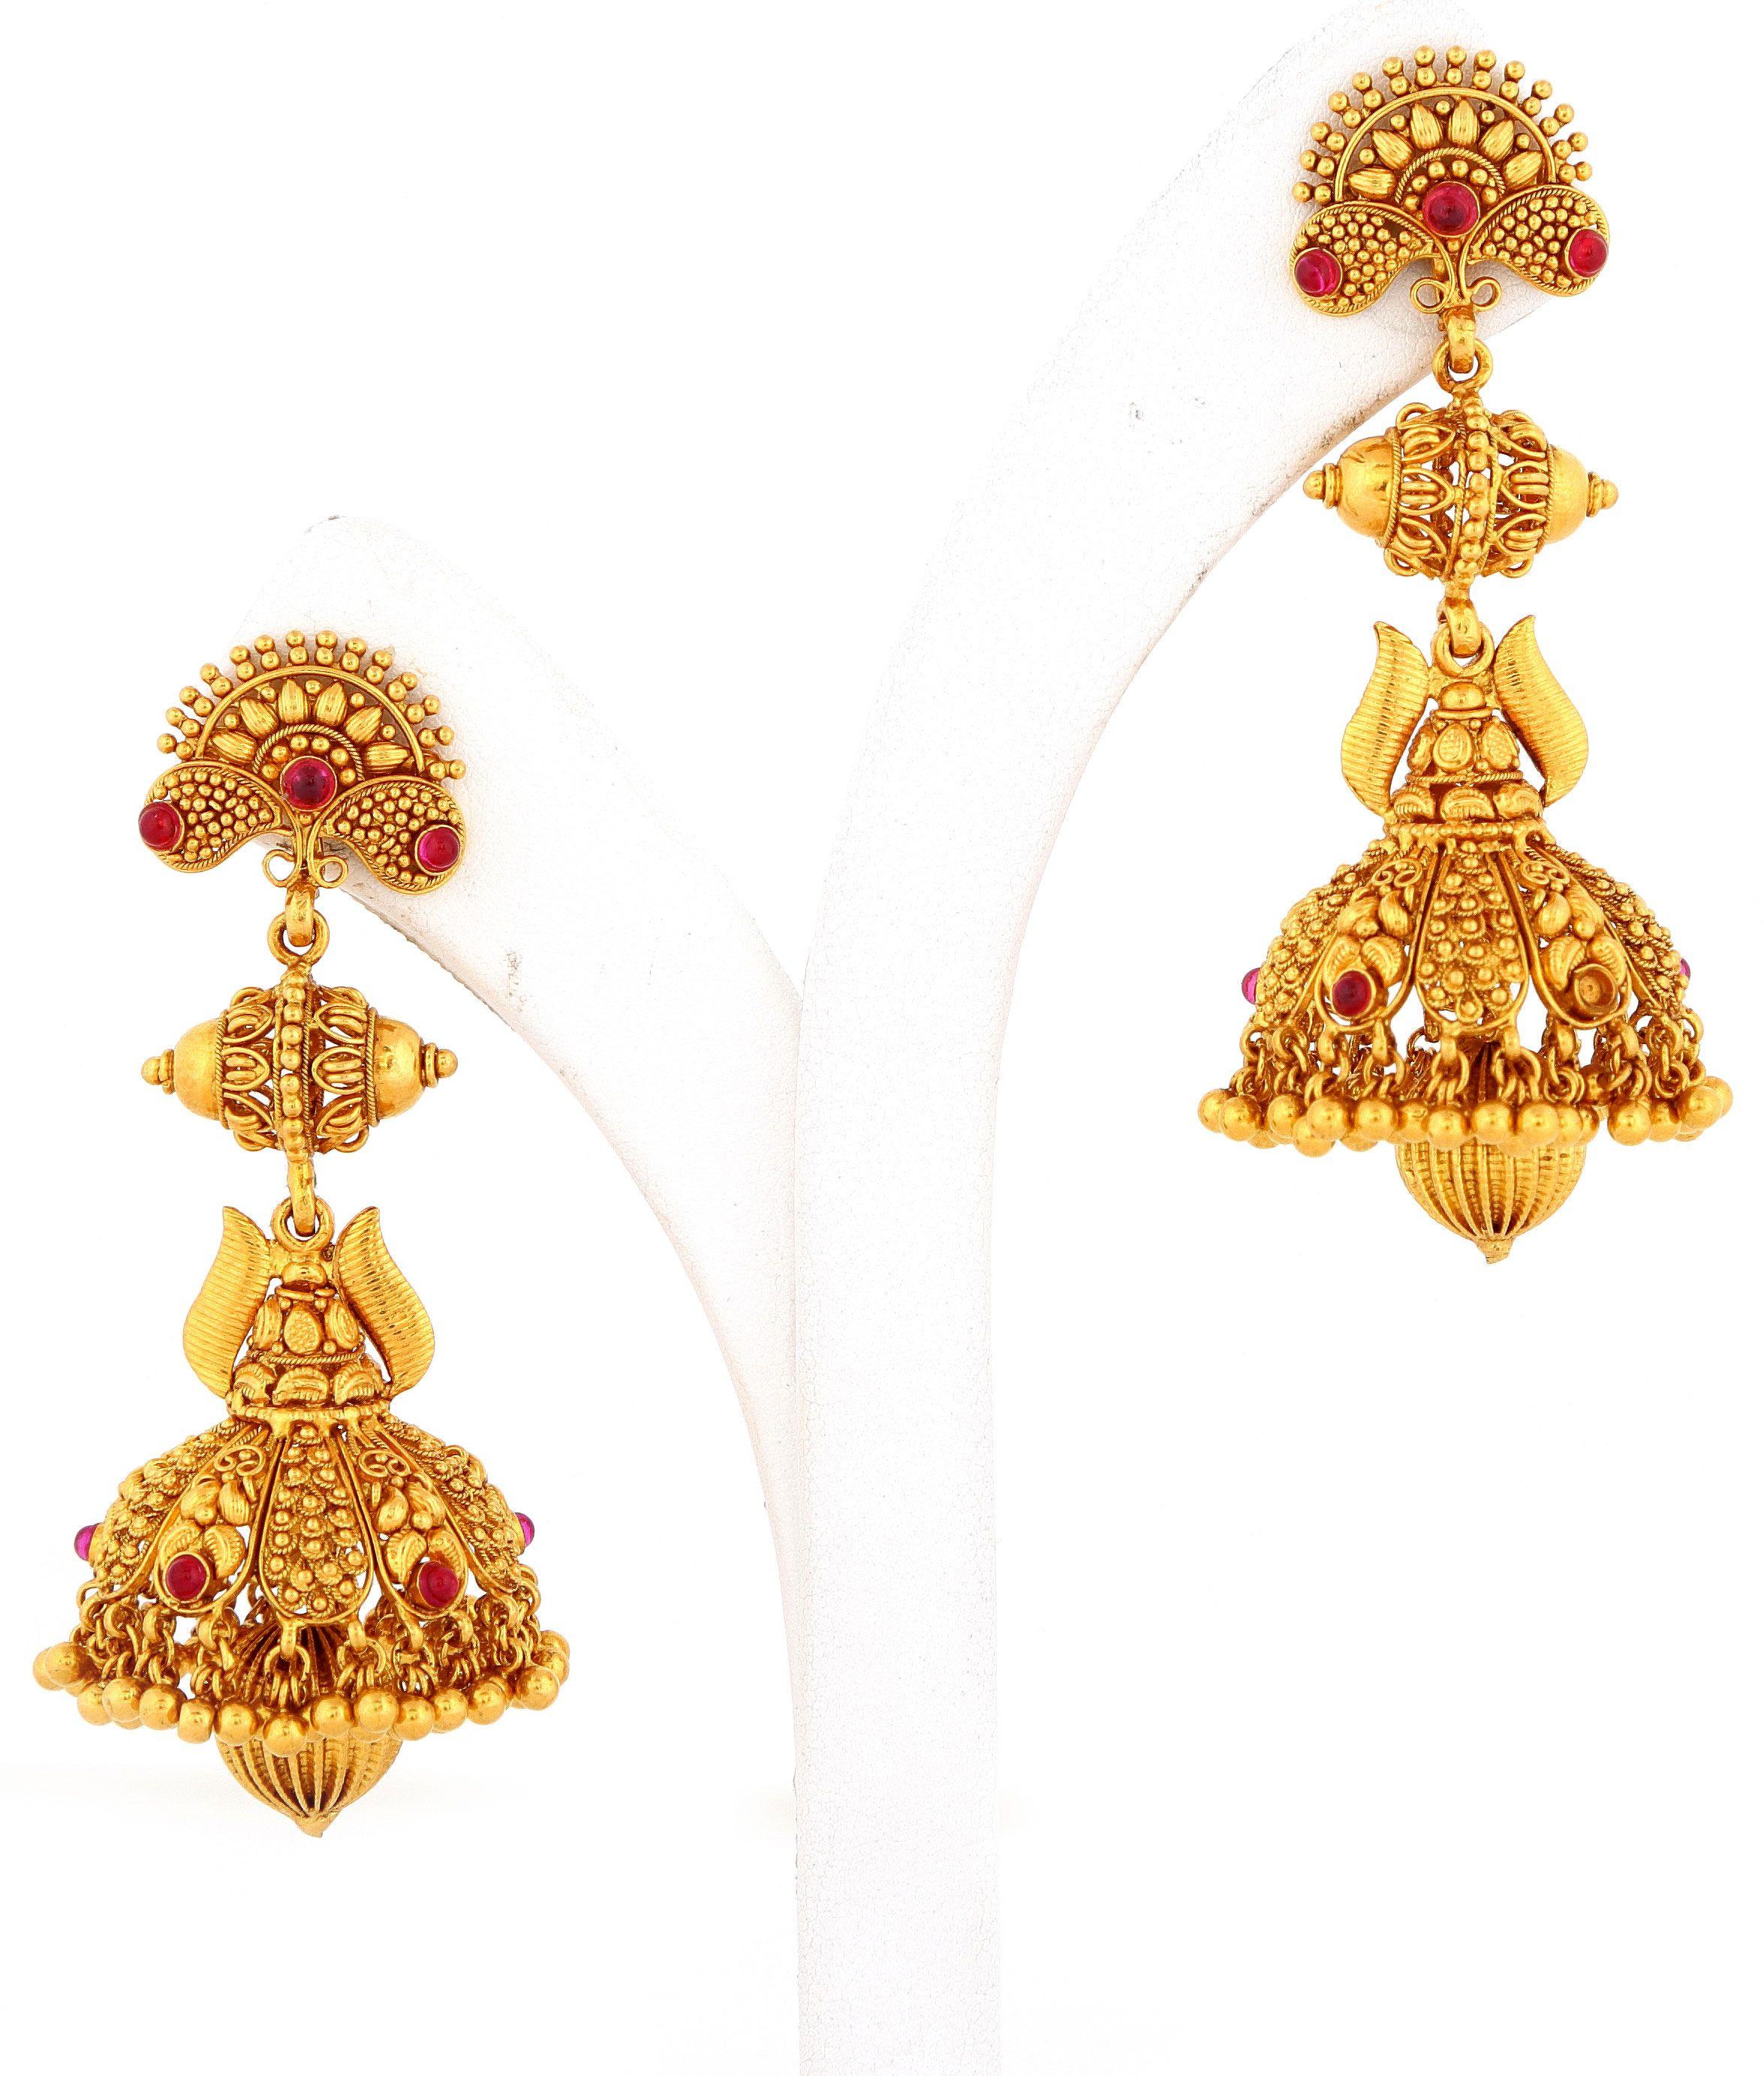 Queen long drop jewelry jhumkka gira re pinterest for Indian jewelry queens ny